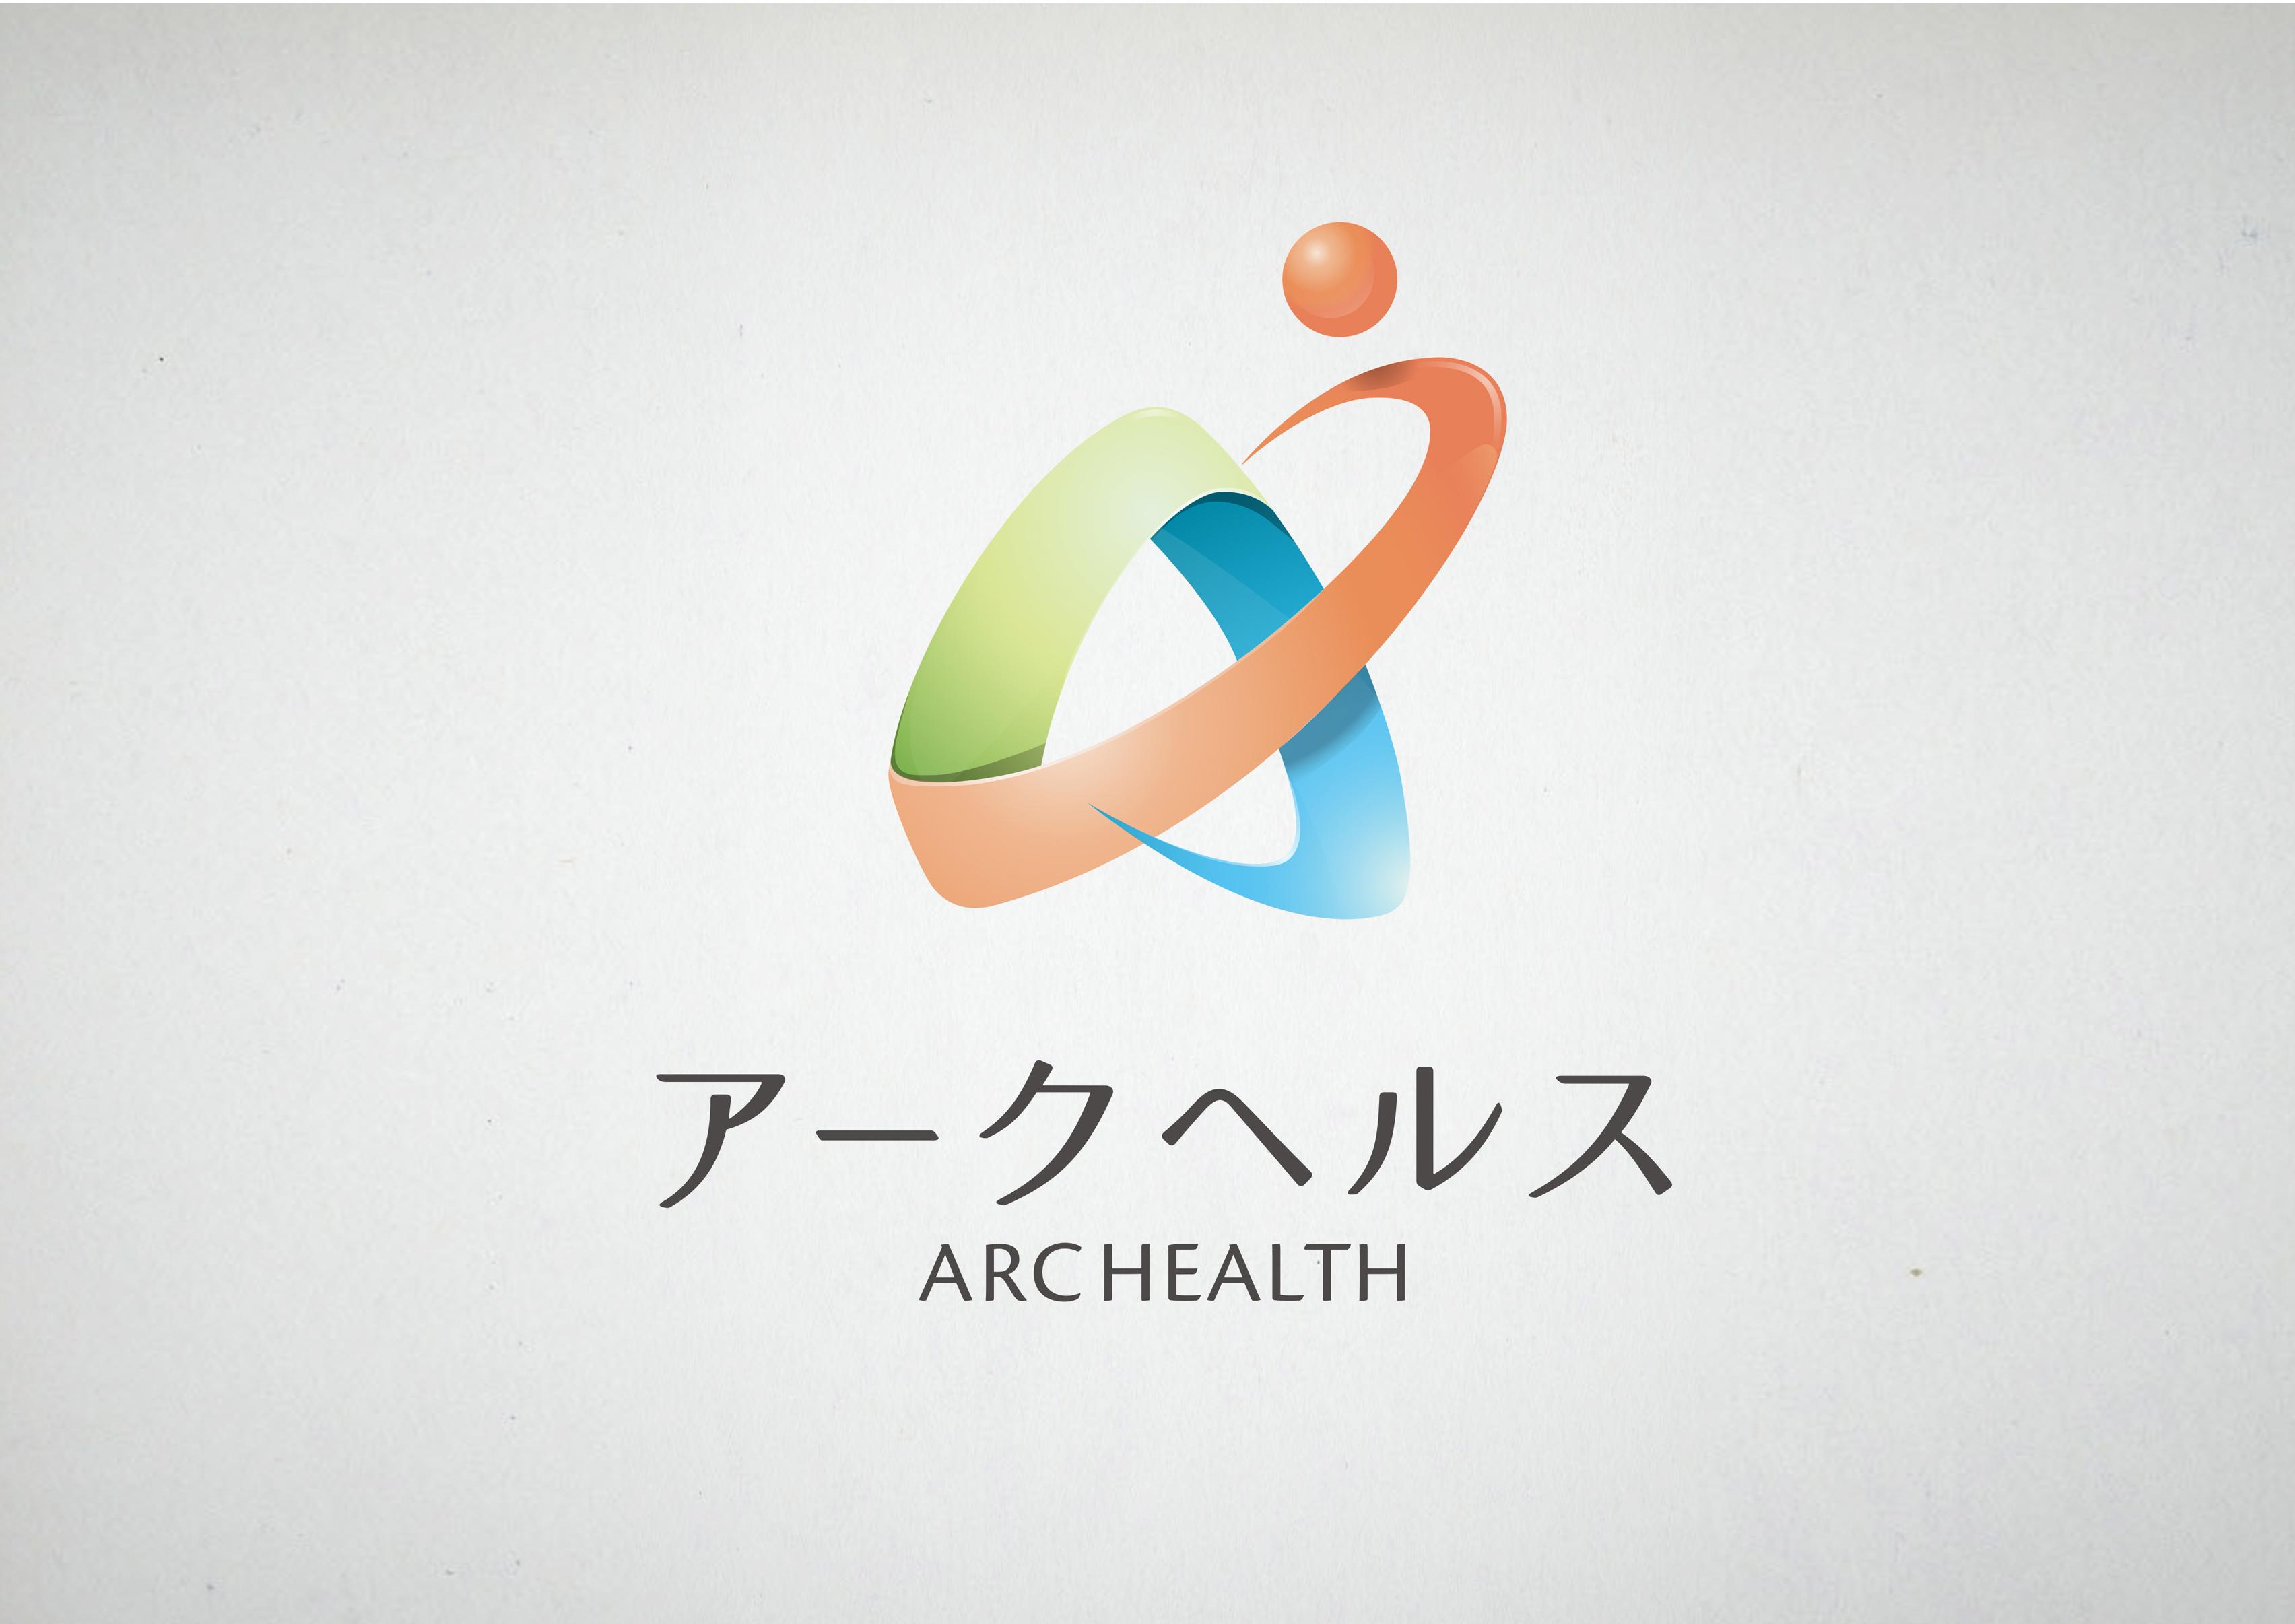 [ARCHEALTH]LogoDesign_20171015-1